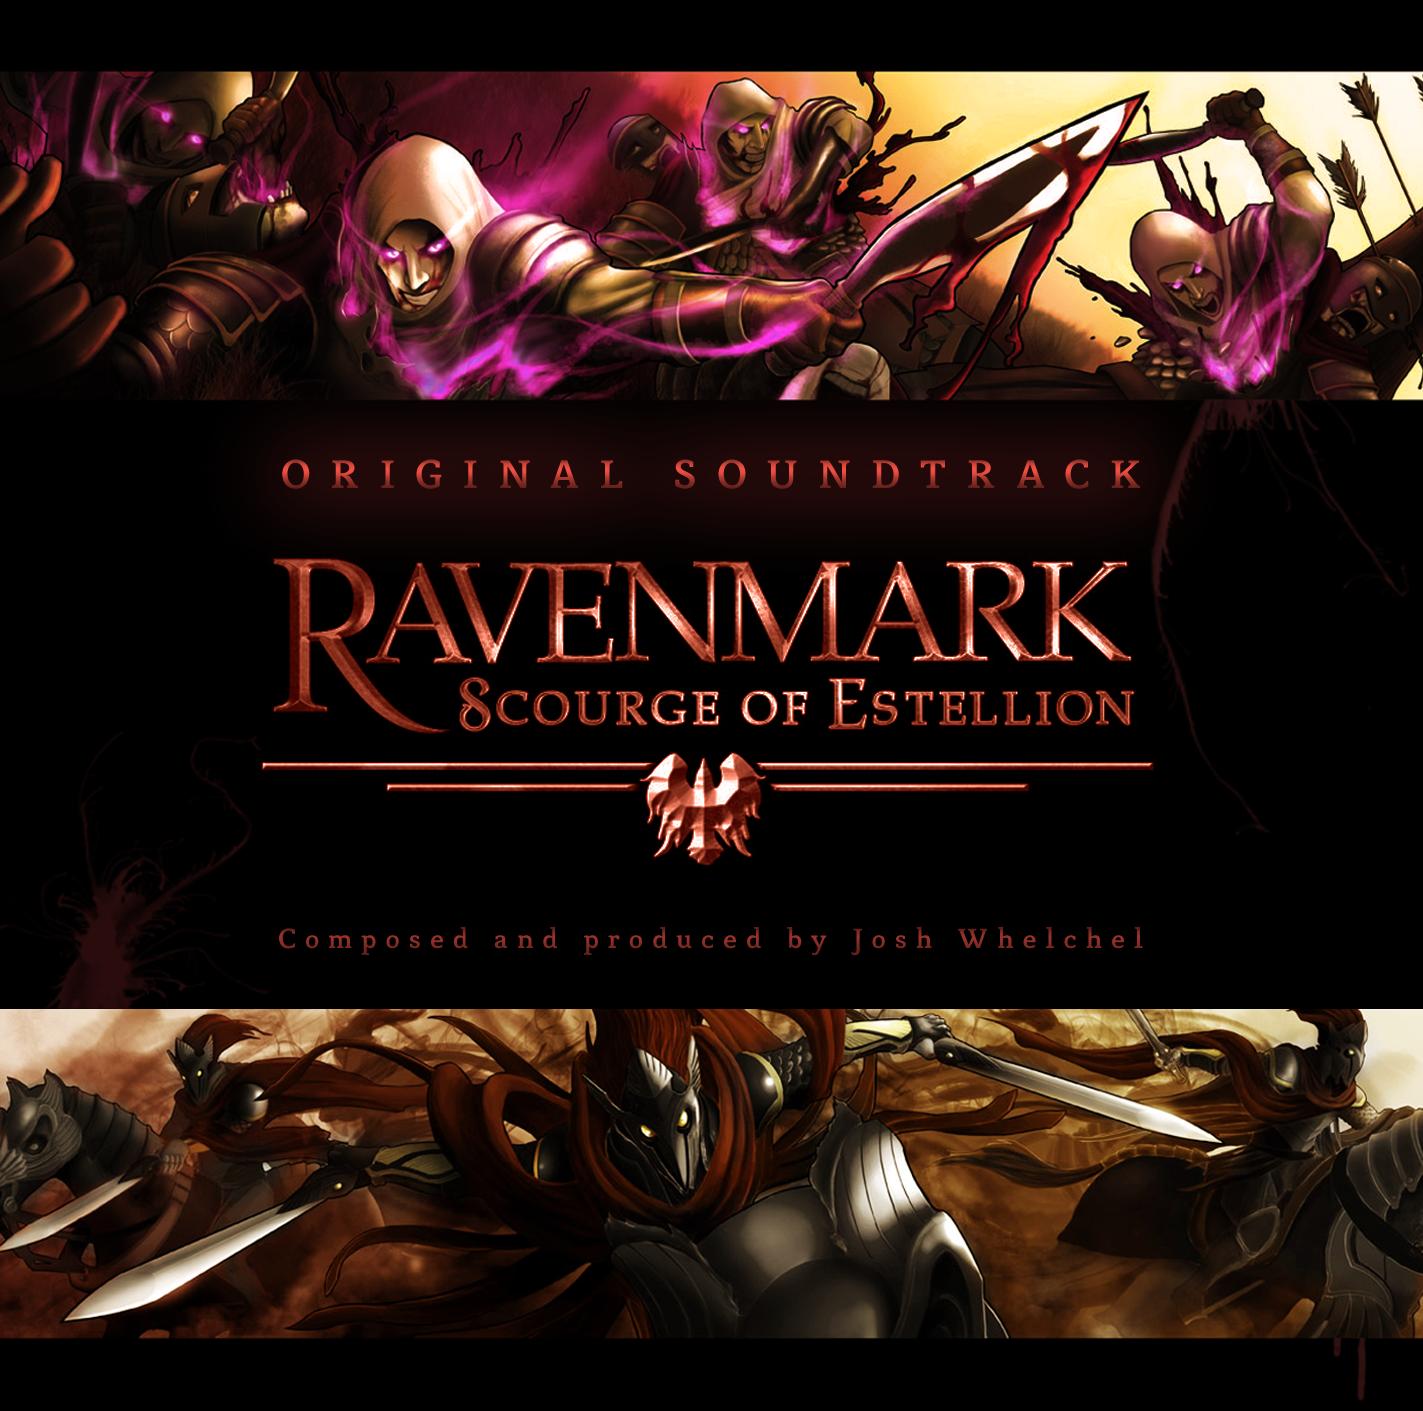 Ravenmark scourge of estellion eng reloaded - english